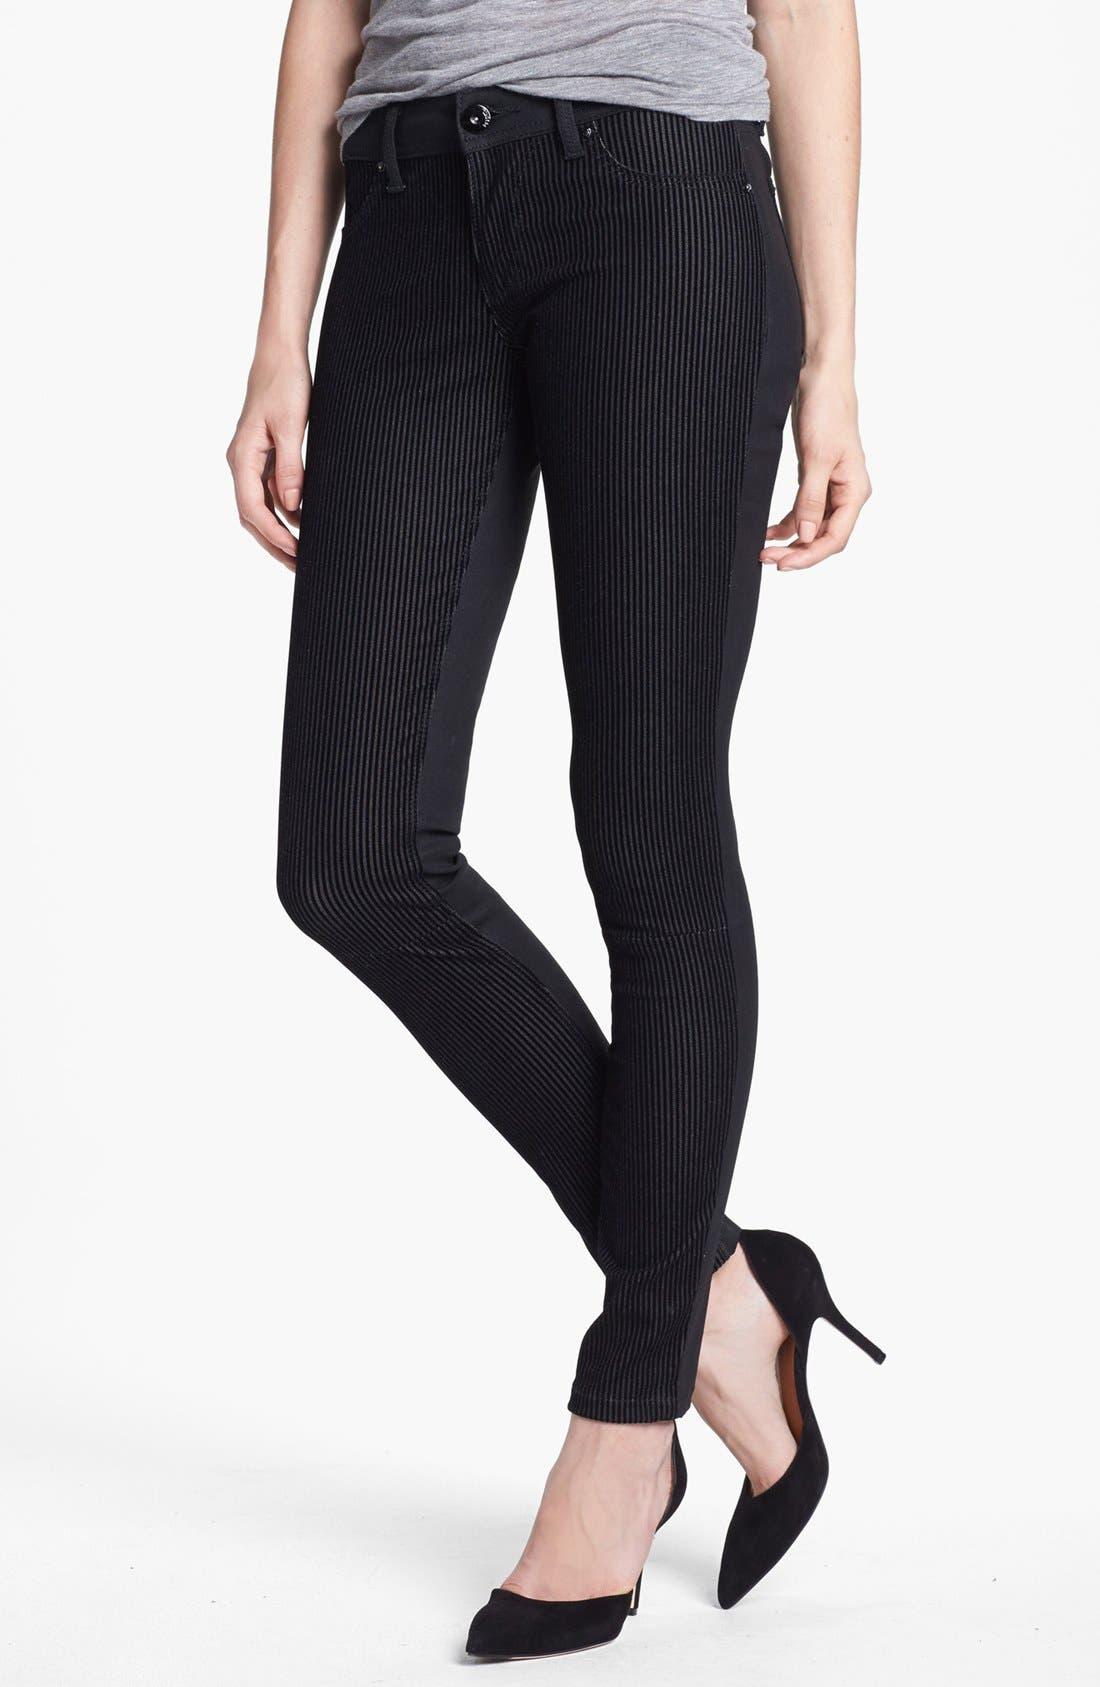 Alternate Image 1 Selected - DL1961 'Emma' Textured Stripe Skinny Jeans (Pandora)